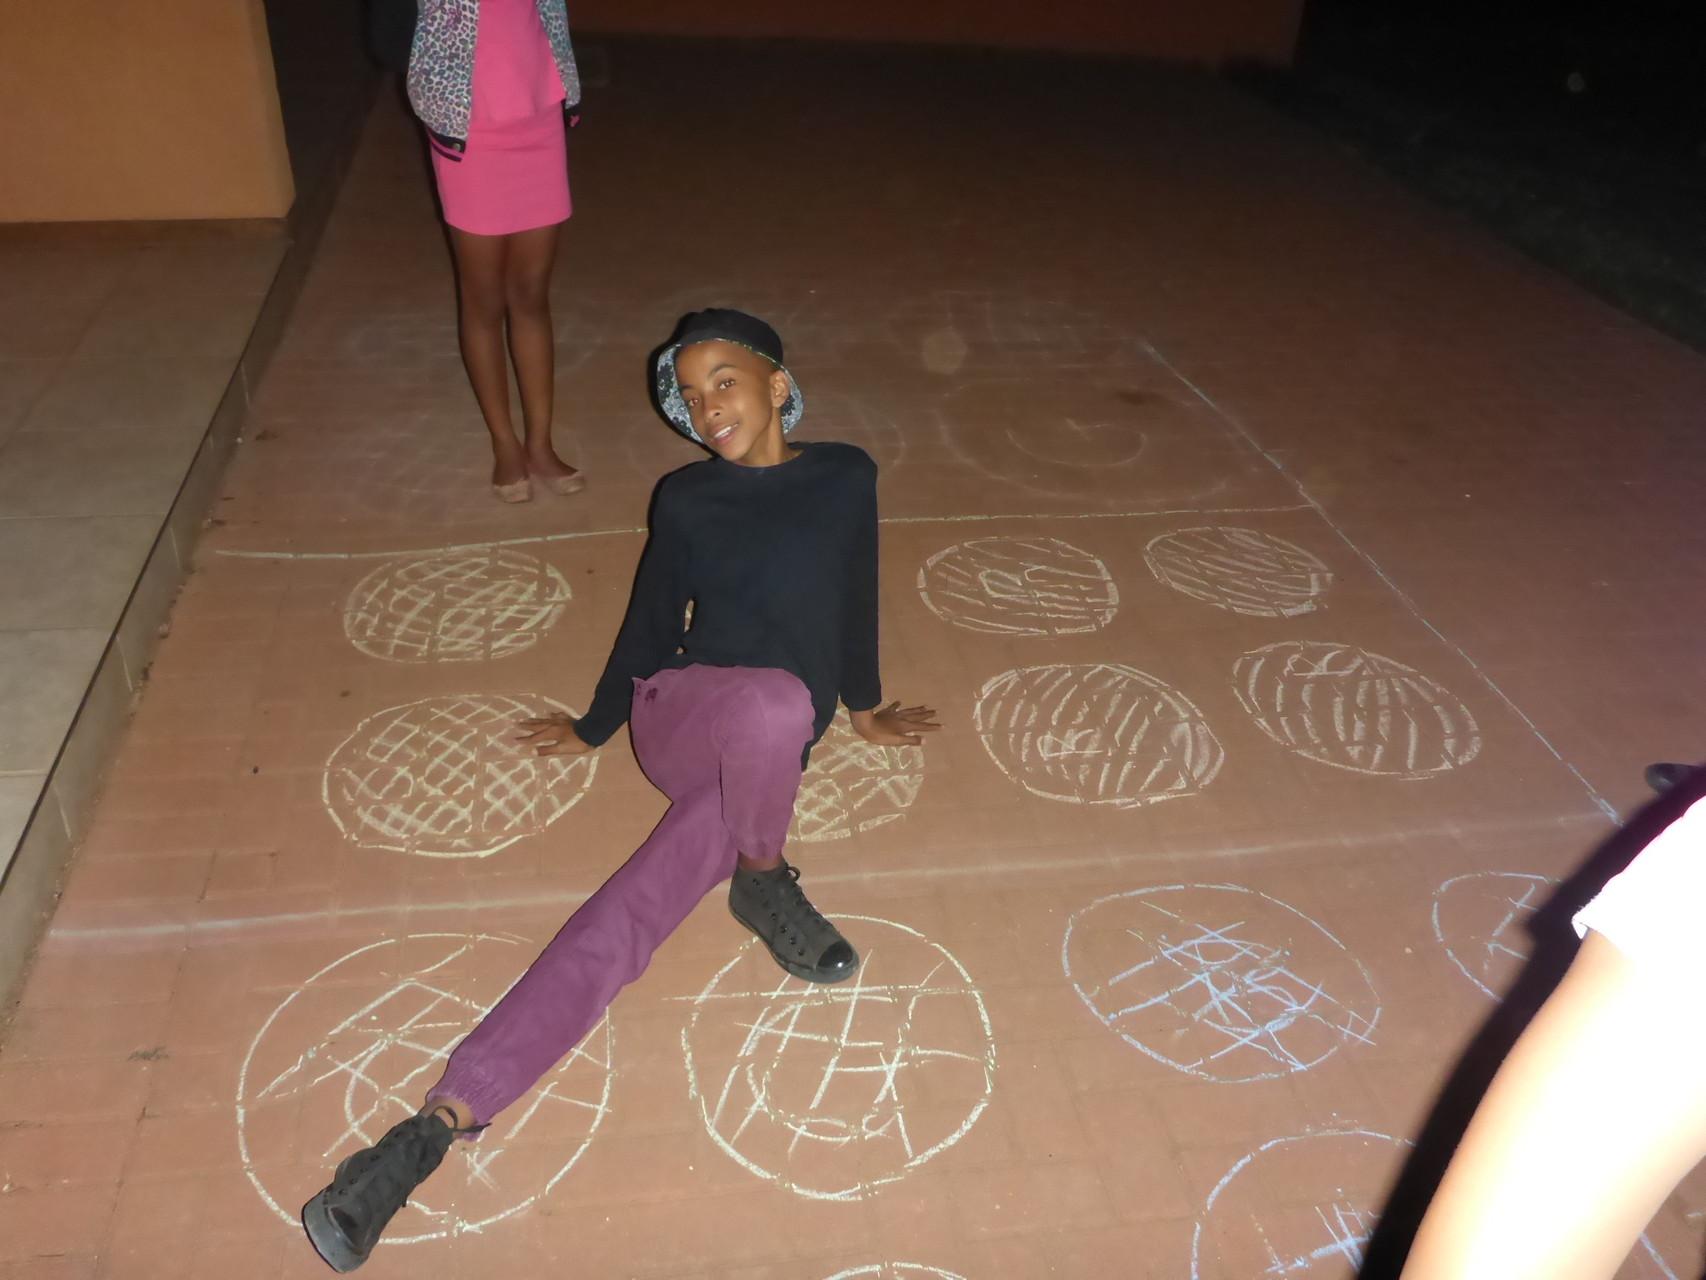 Casino night (Twister)